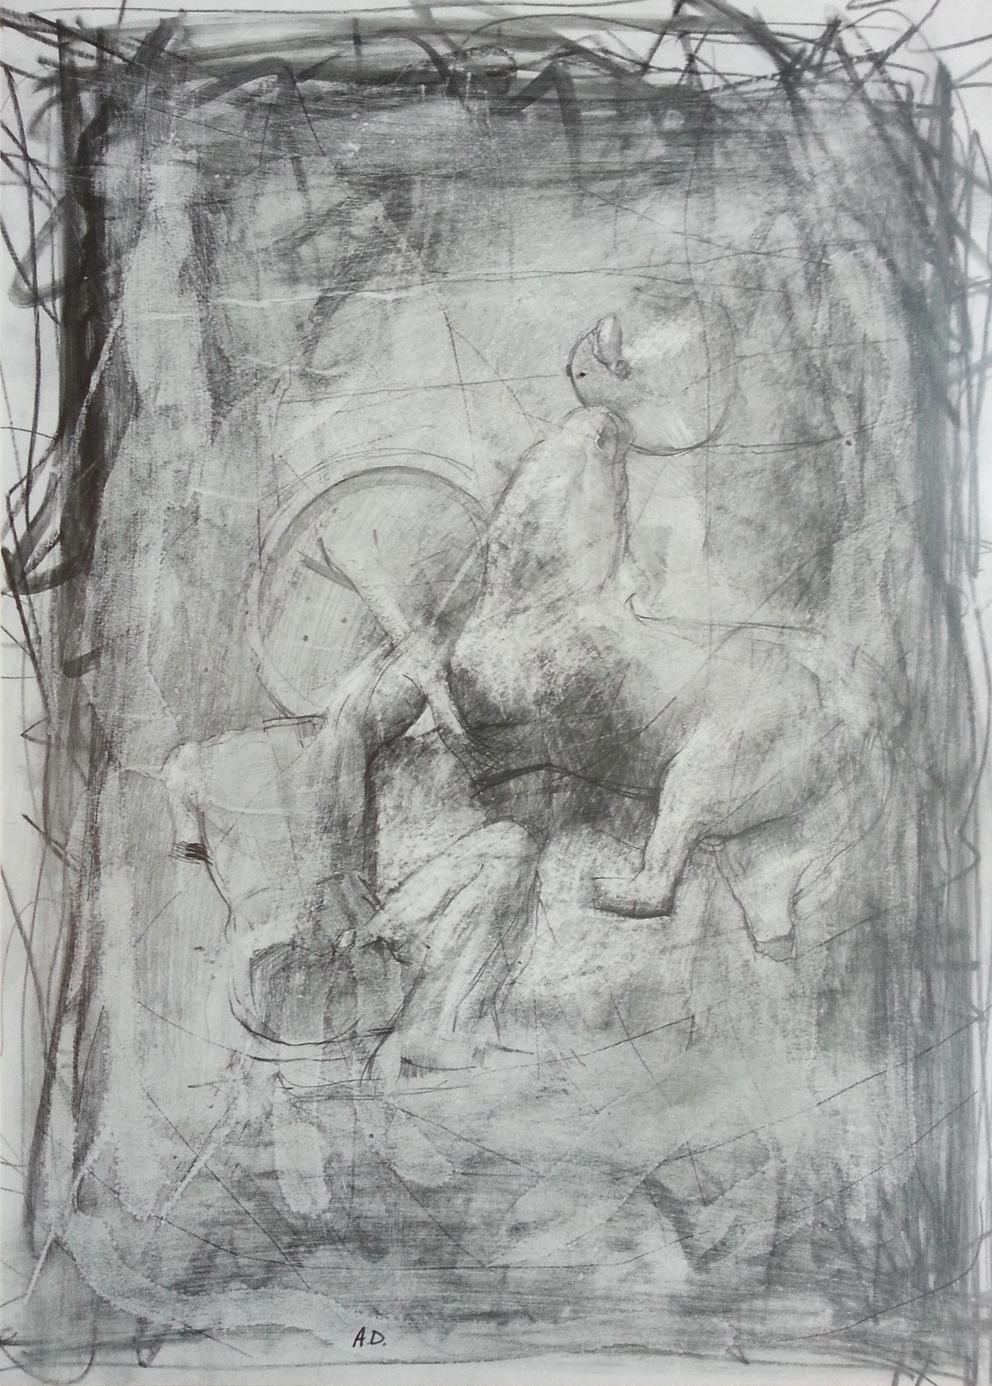 drawing of lapith & centaur by alan dedman